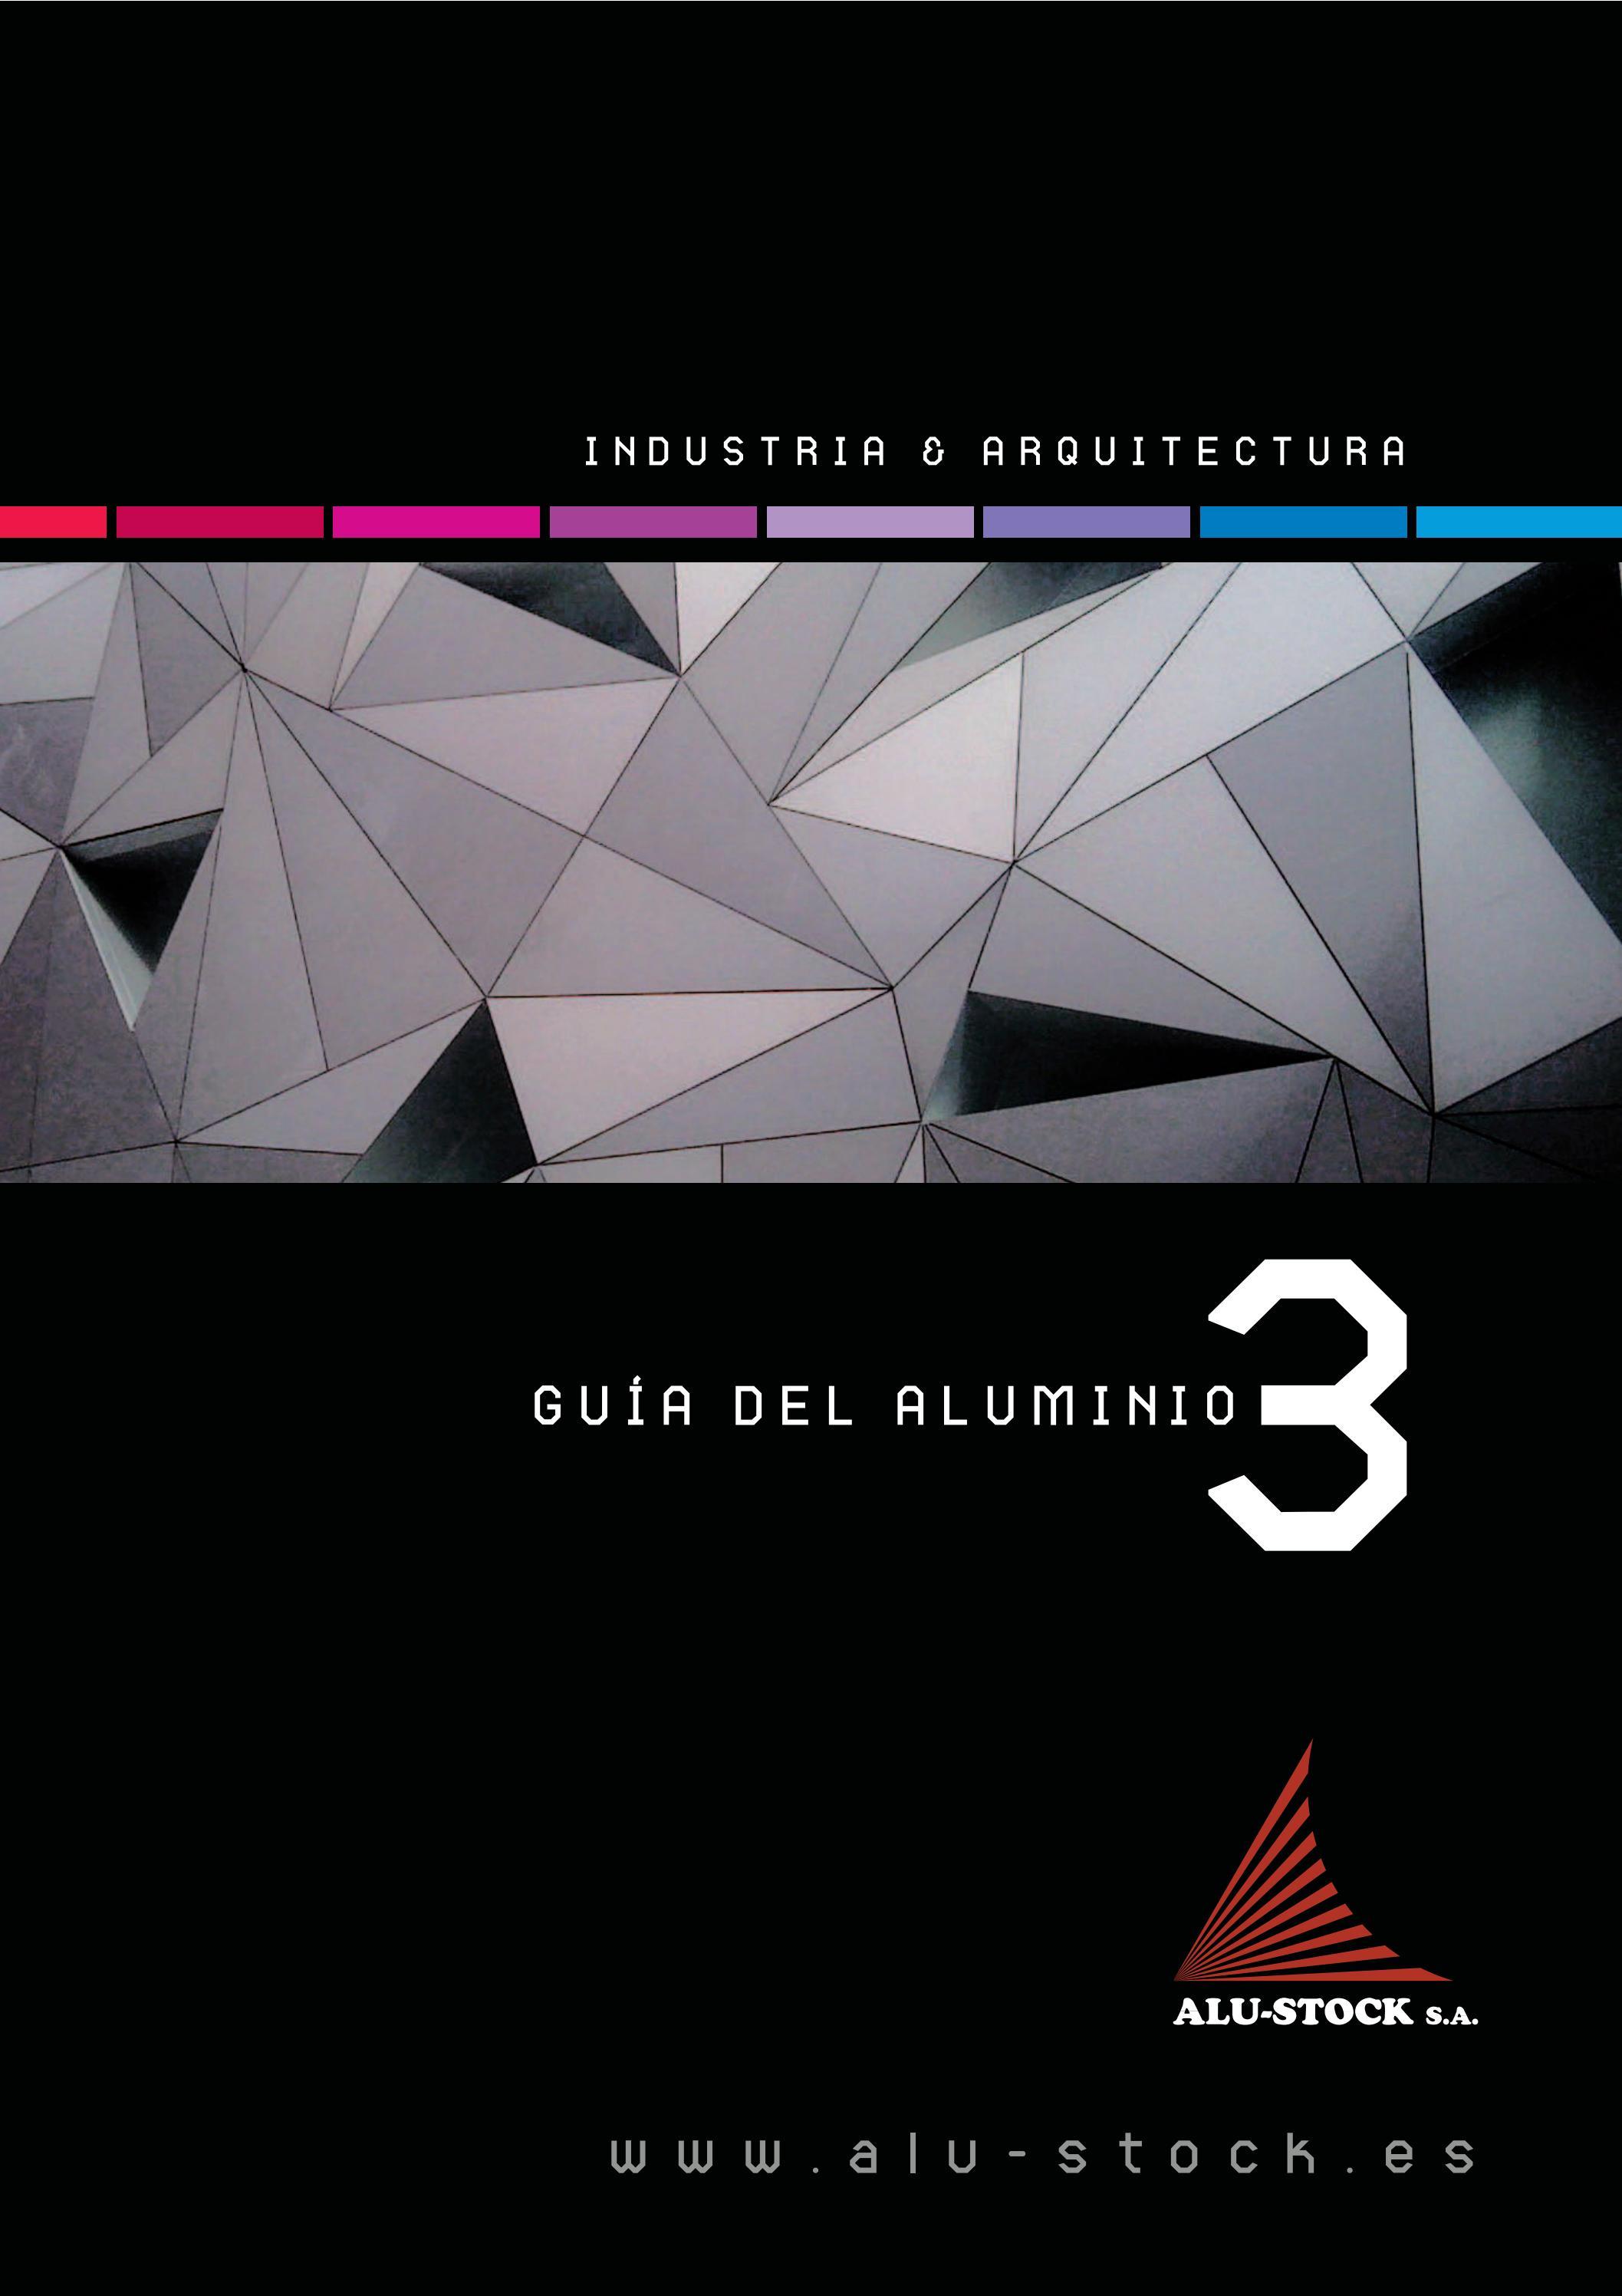 Gu a del aluminio 3 by alu stock s a issuu - Guia de aluminio ...